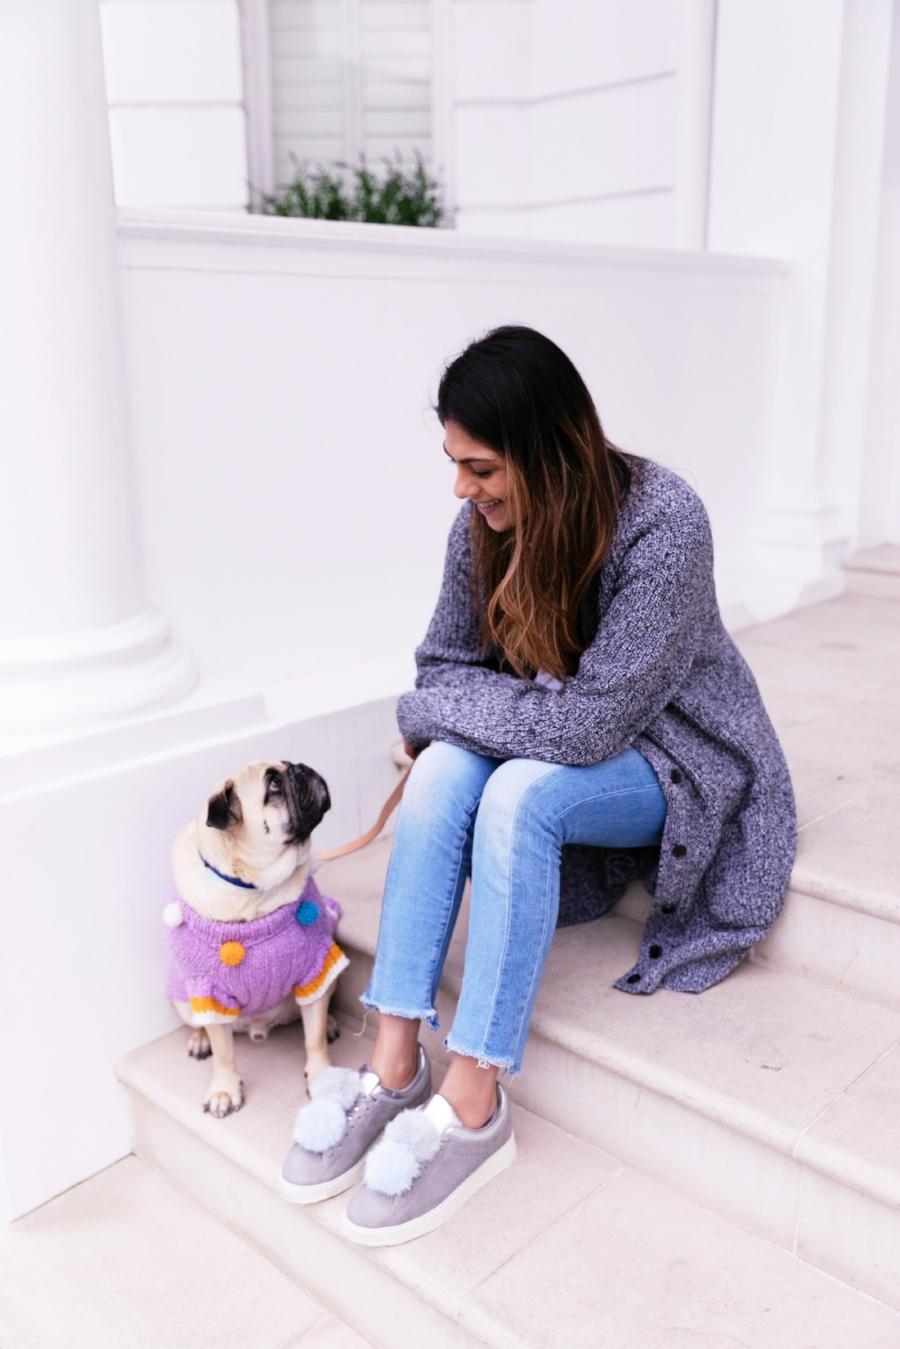 humanandhound-twinning-fashion-london-twinningiswinning-ariandm-spring-dogfashion-stylishdogs-bestdresseddog-pug-pugfashion-dogsinclothes-springjumper-best-dogfashionblog-dogblog-bestdogblog-topdogblog-humanandhoundblog-bestdogbloginlondon-streetstyle-londonstreetstyle-humanandhoundstreetstyle